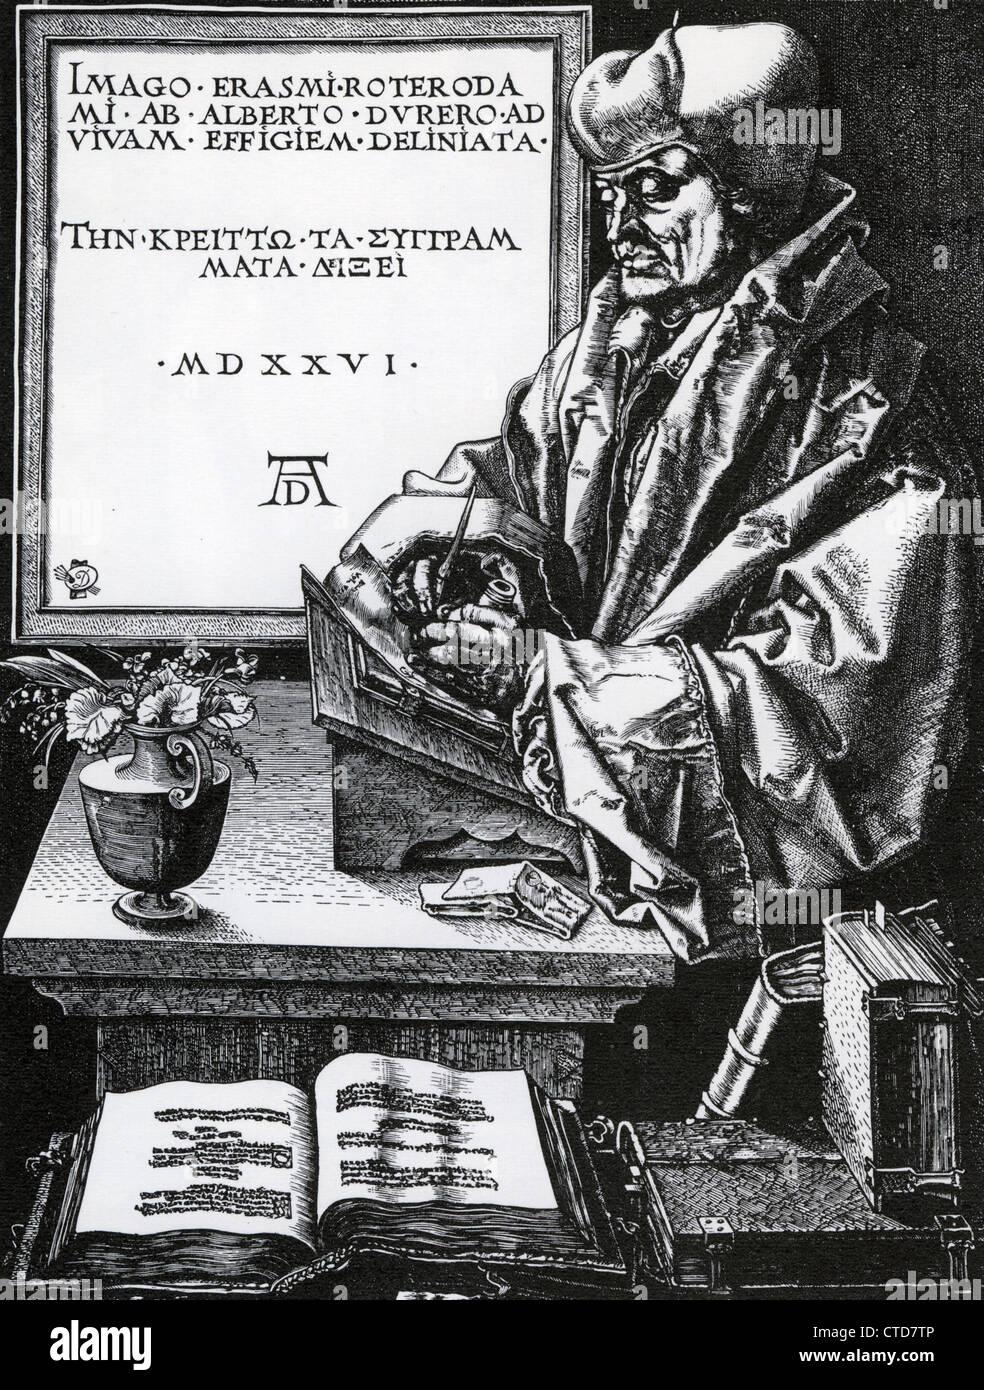 DESIDERIUS ERASMUS (c 1466-1536) Dutch Renaissance humanist in a woodcut by Albrecht Durer - Stock Image